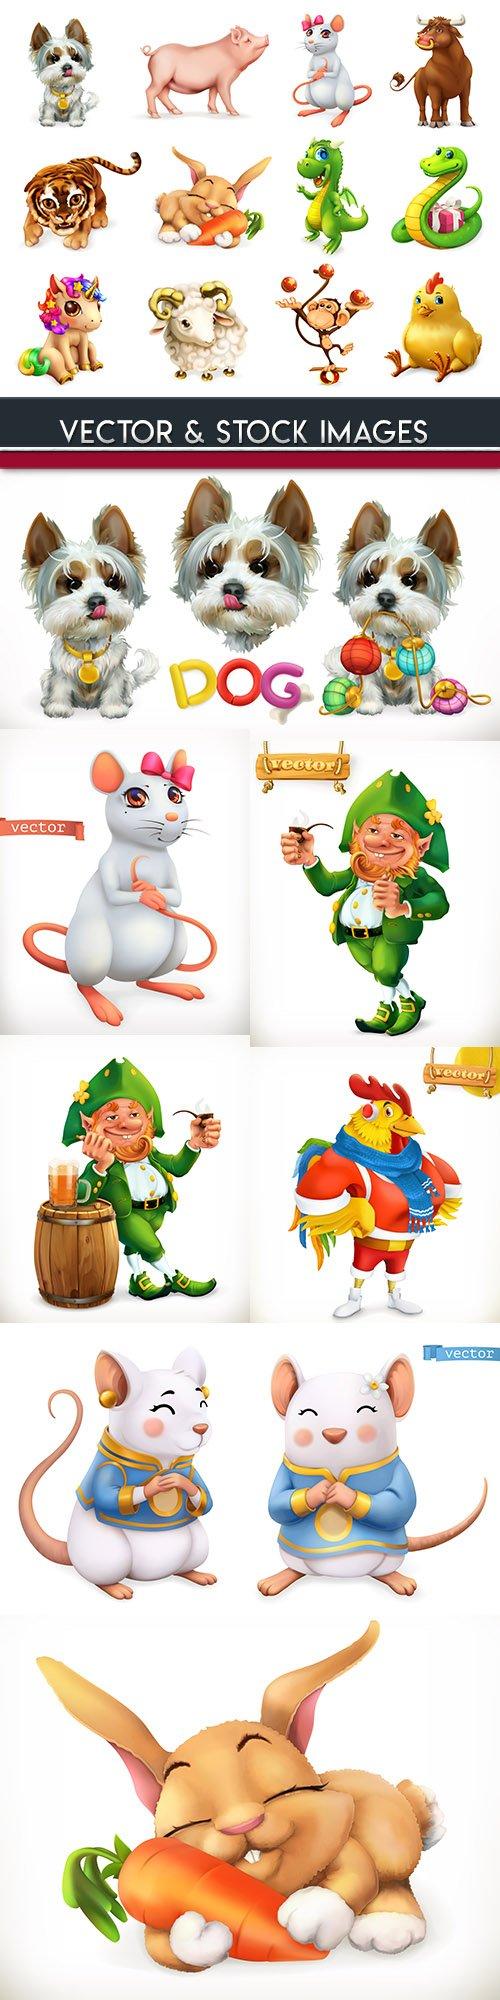 Zodiac signs and animals cartoon 3d illustration